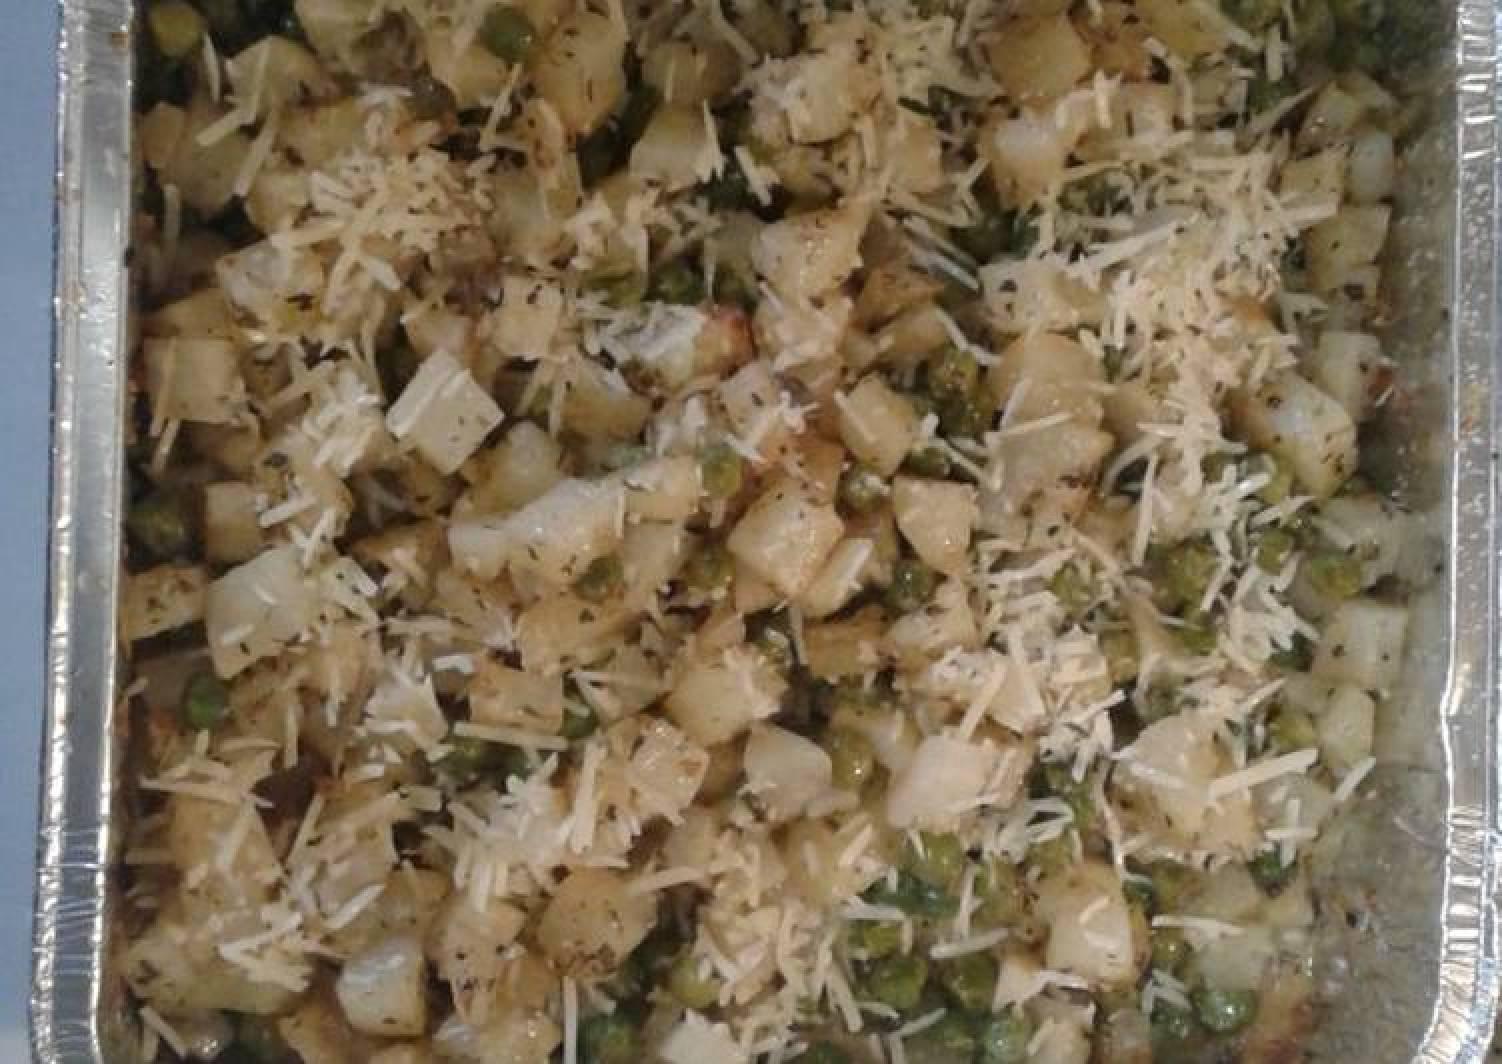 Roasted potatoes and peas